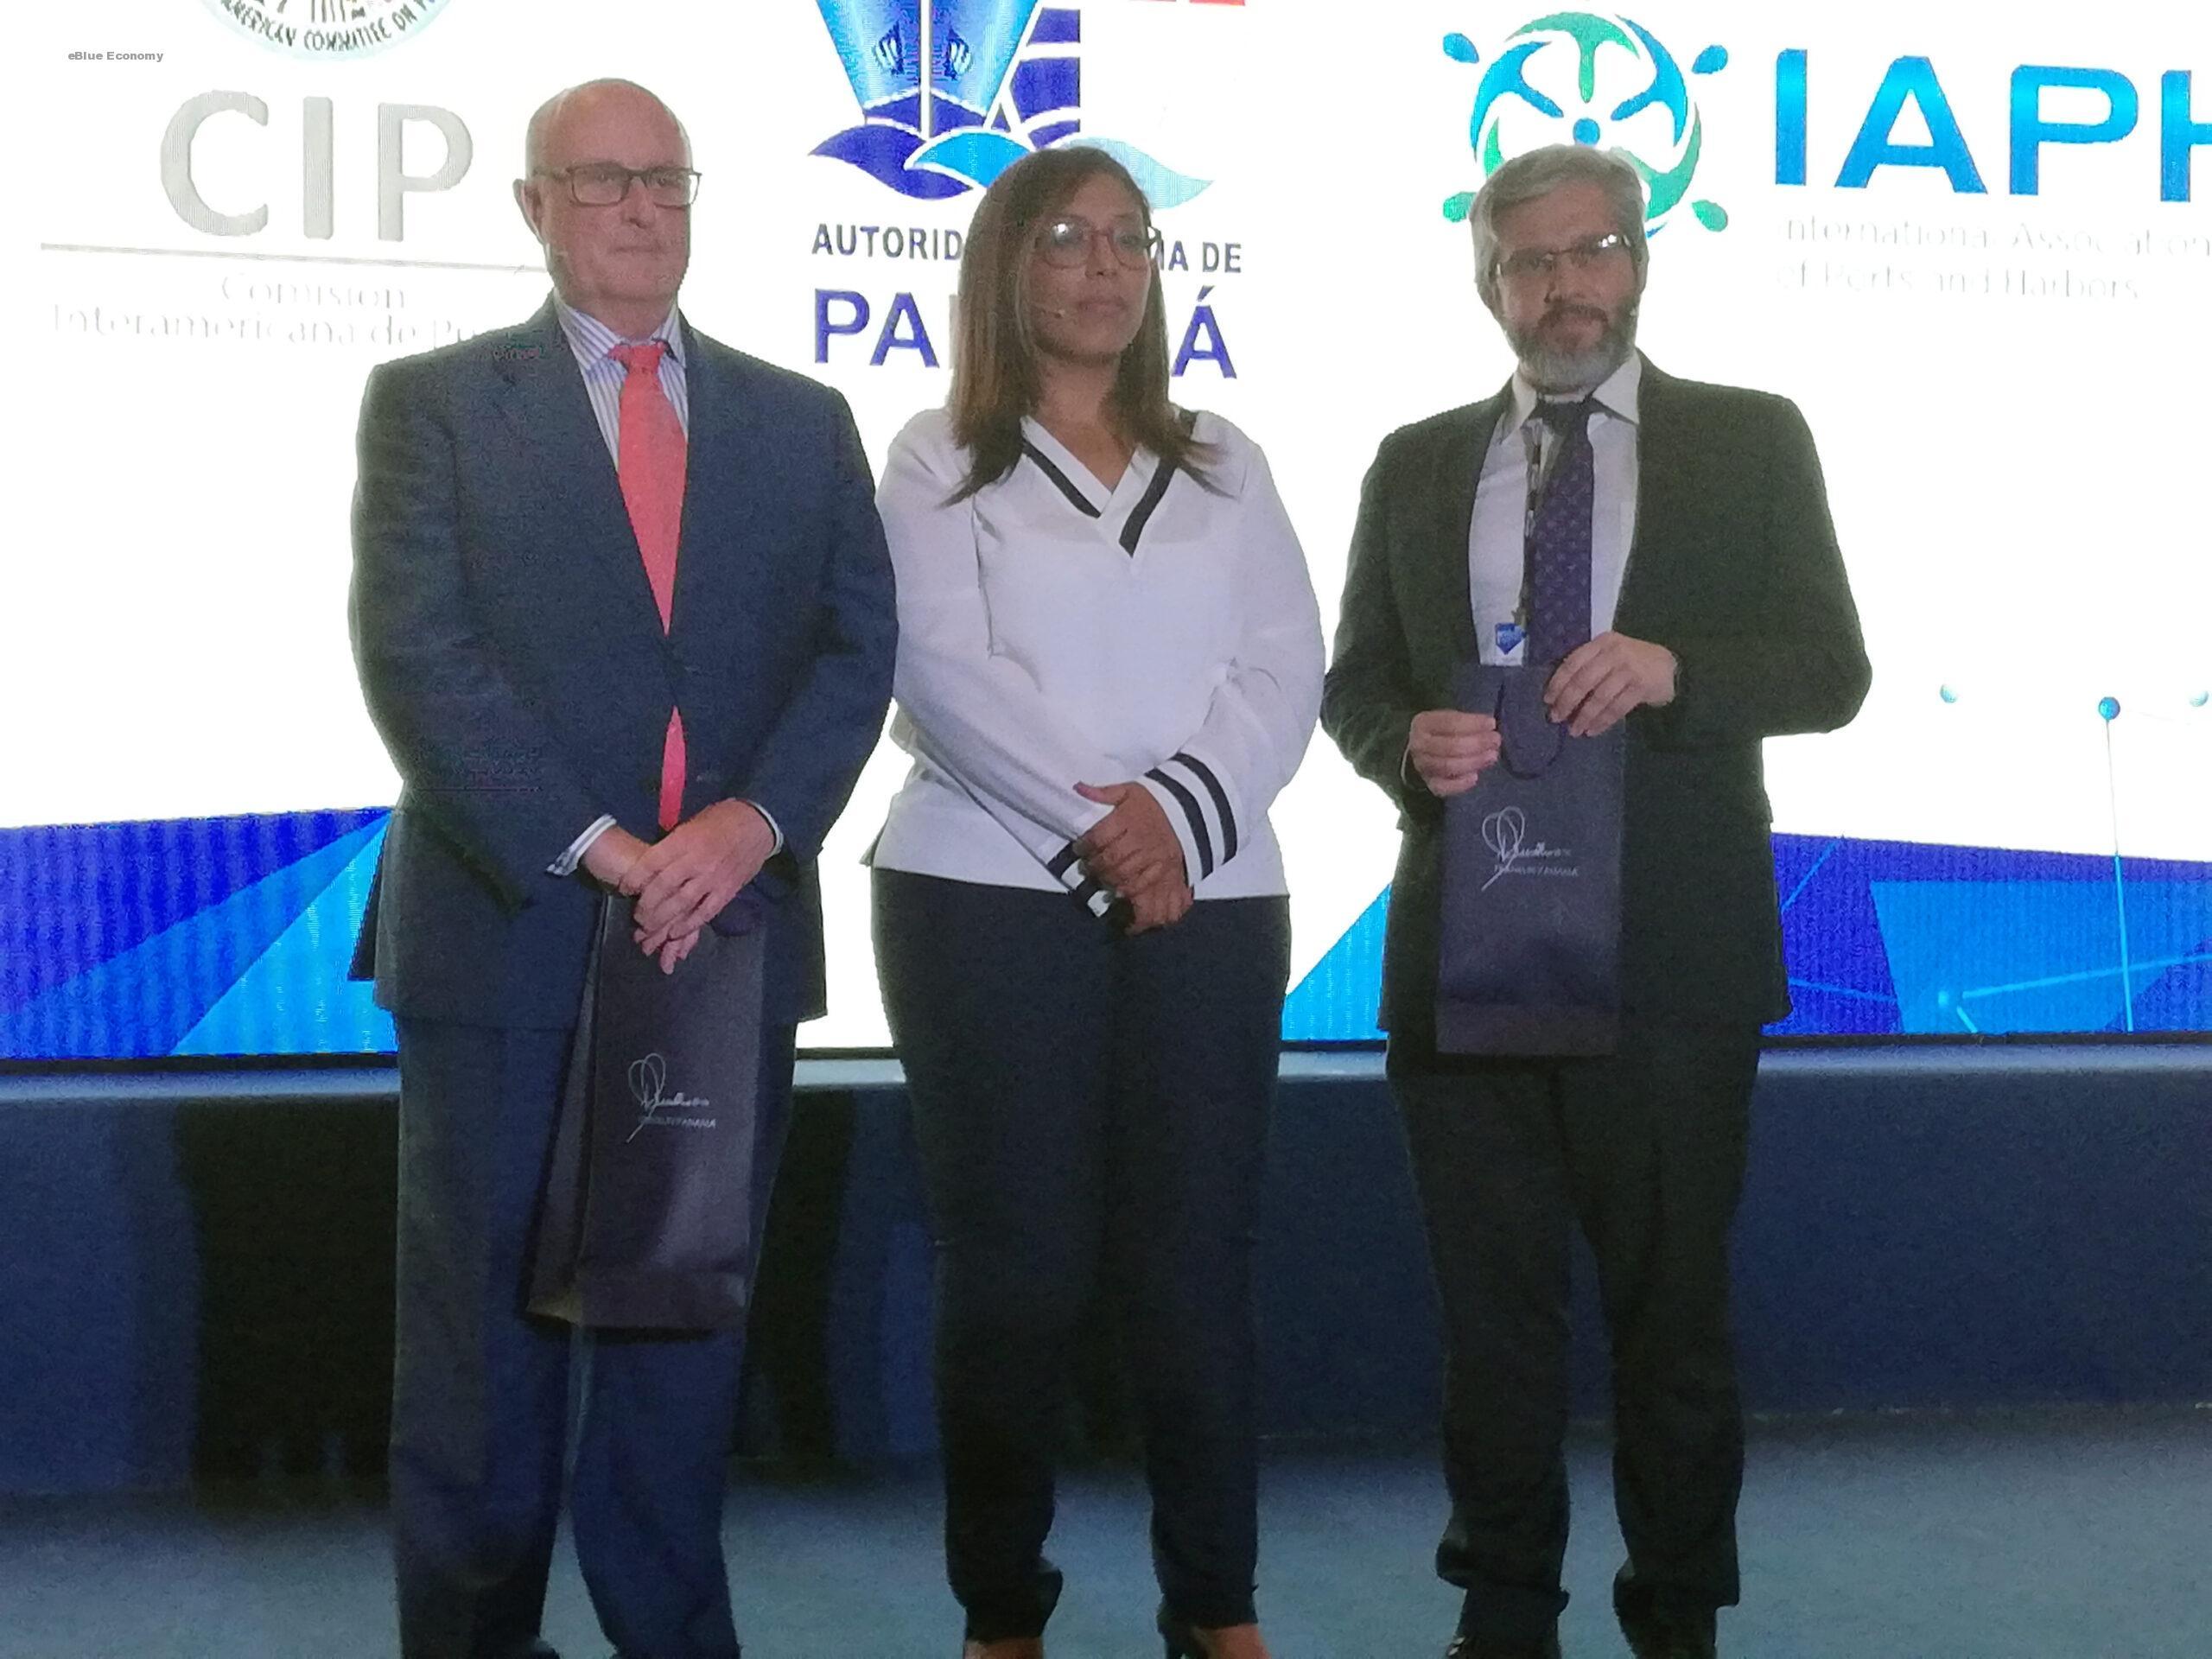 eBlue_economy_Panama Maritime and Port Development Strategic Plan_ Vision 2040